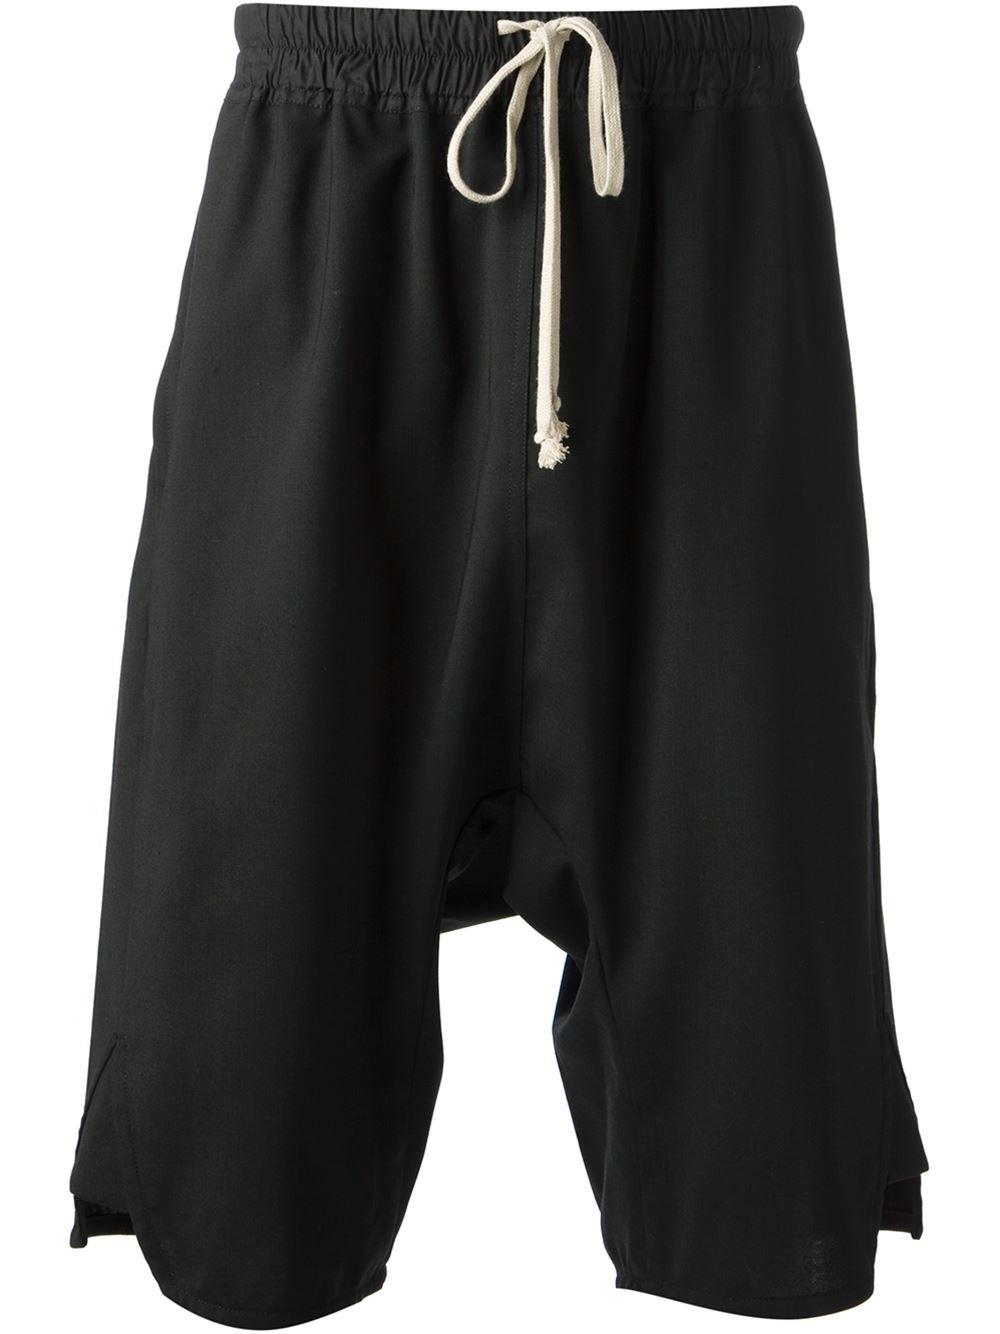 Amazoncom: open crotch boy shorts: